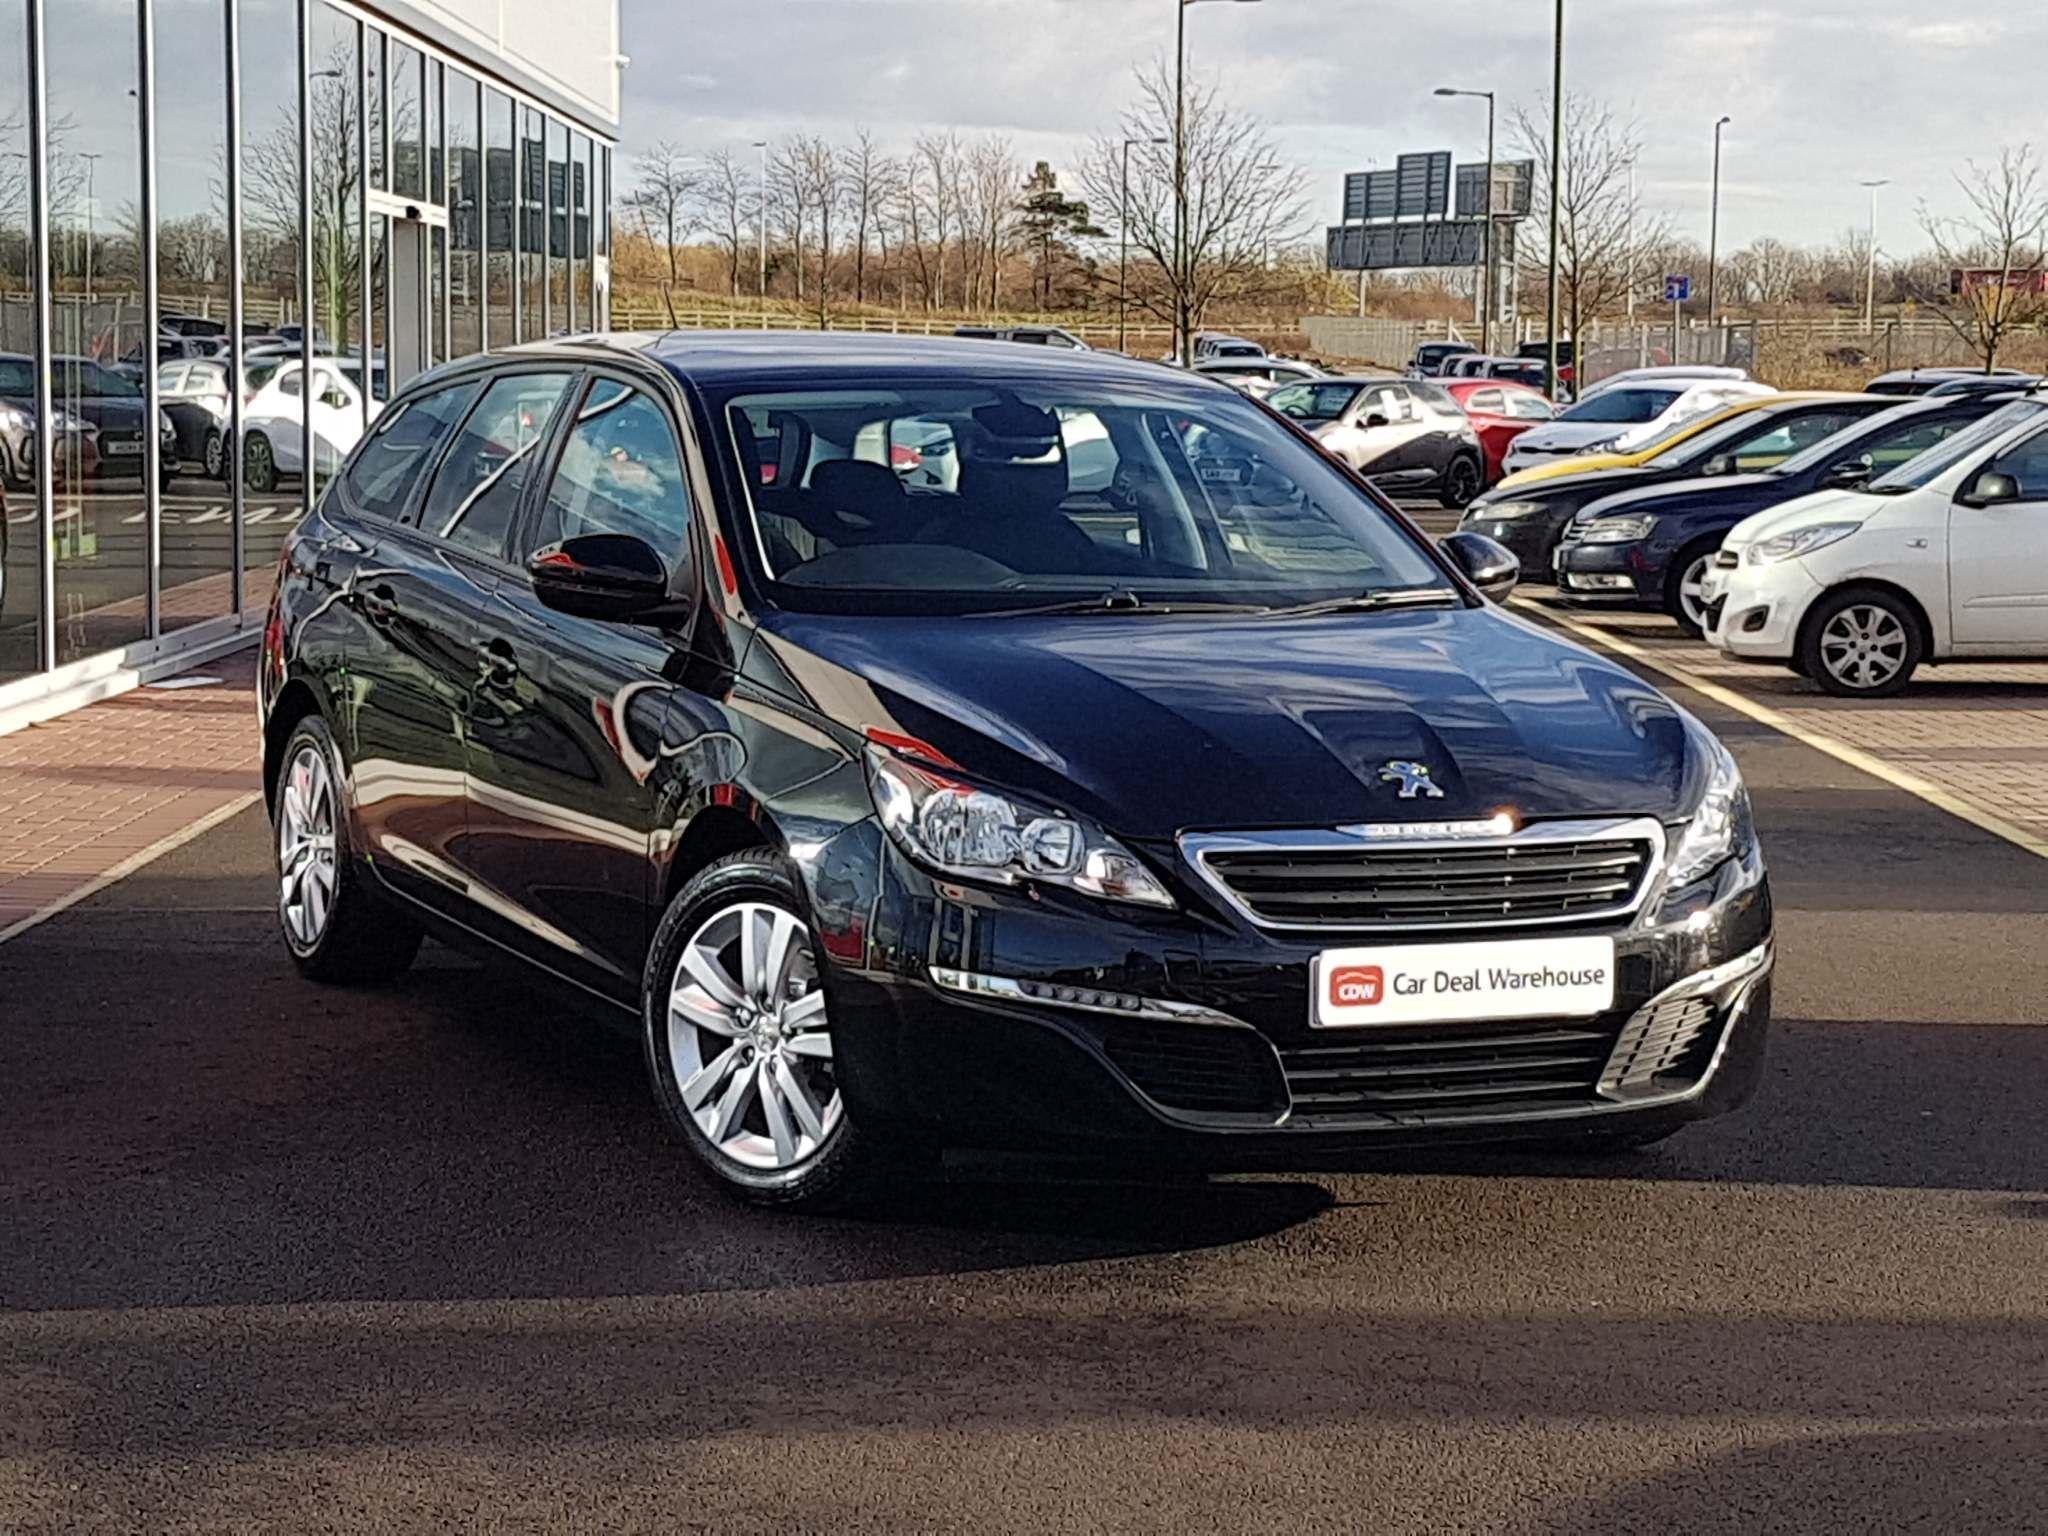 Peugeot 308 SW for sale